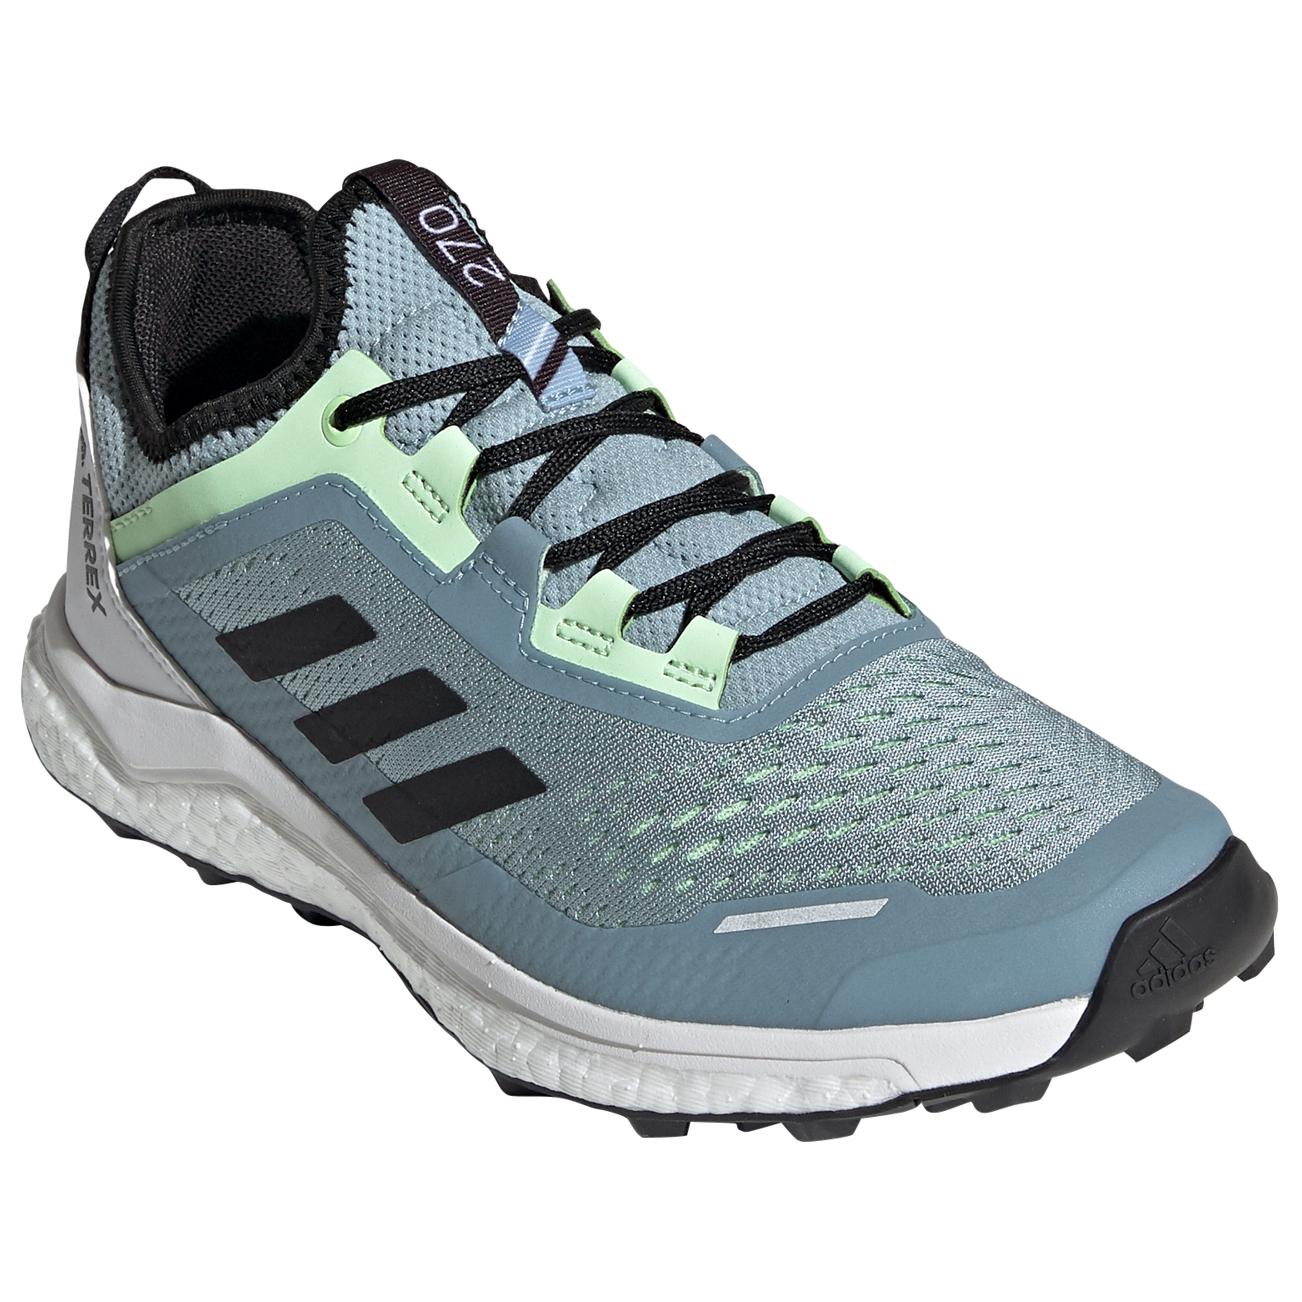 adidas Terrex Agravic Trail Running Shoes Svart | adidas